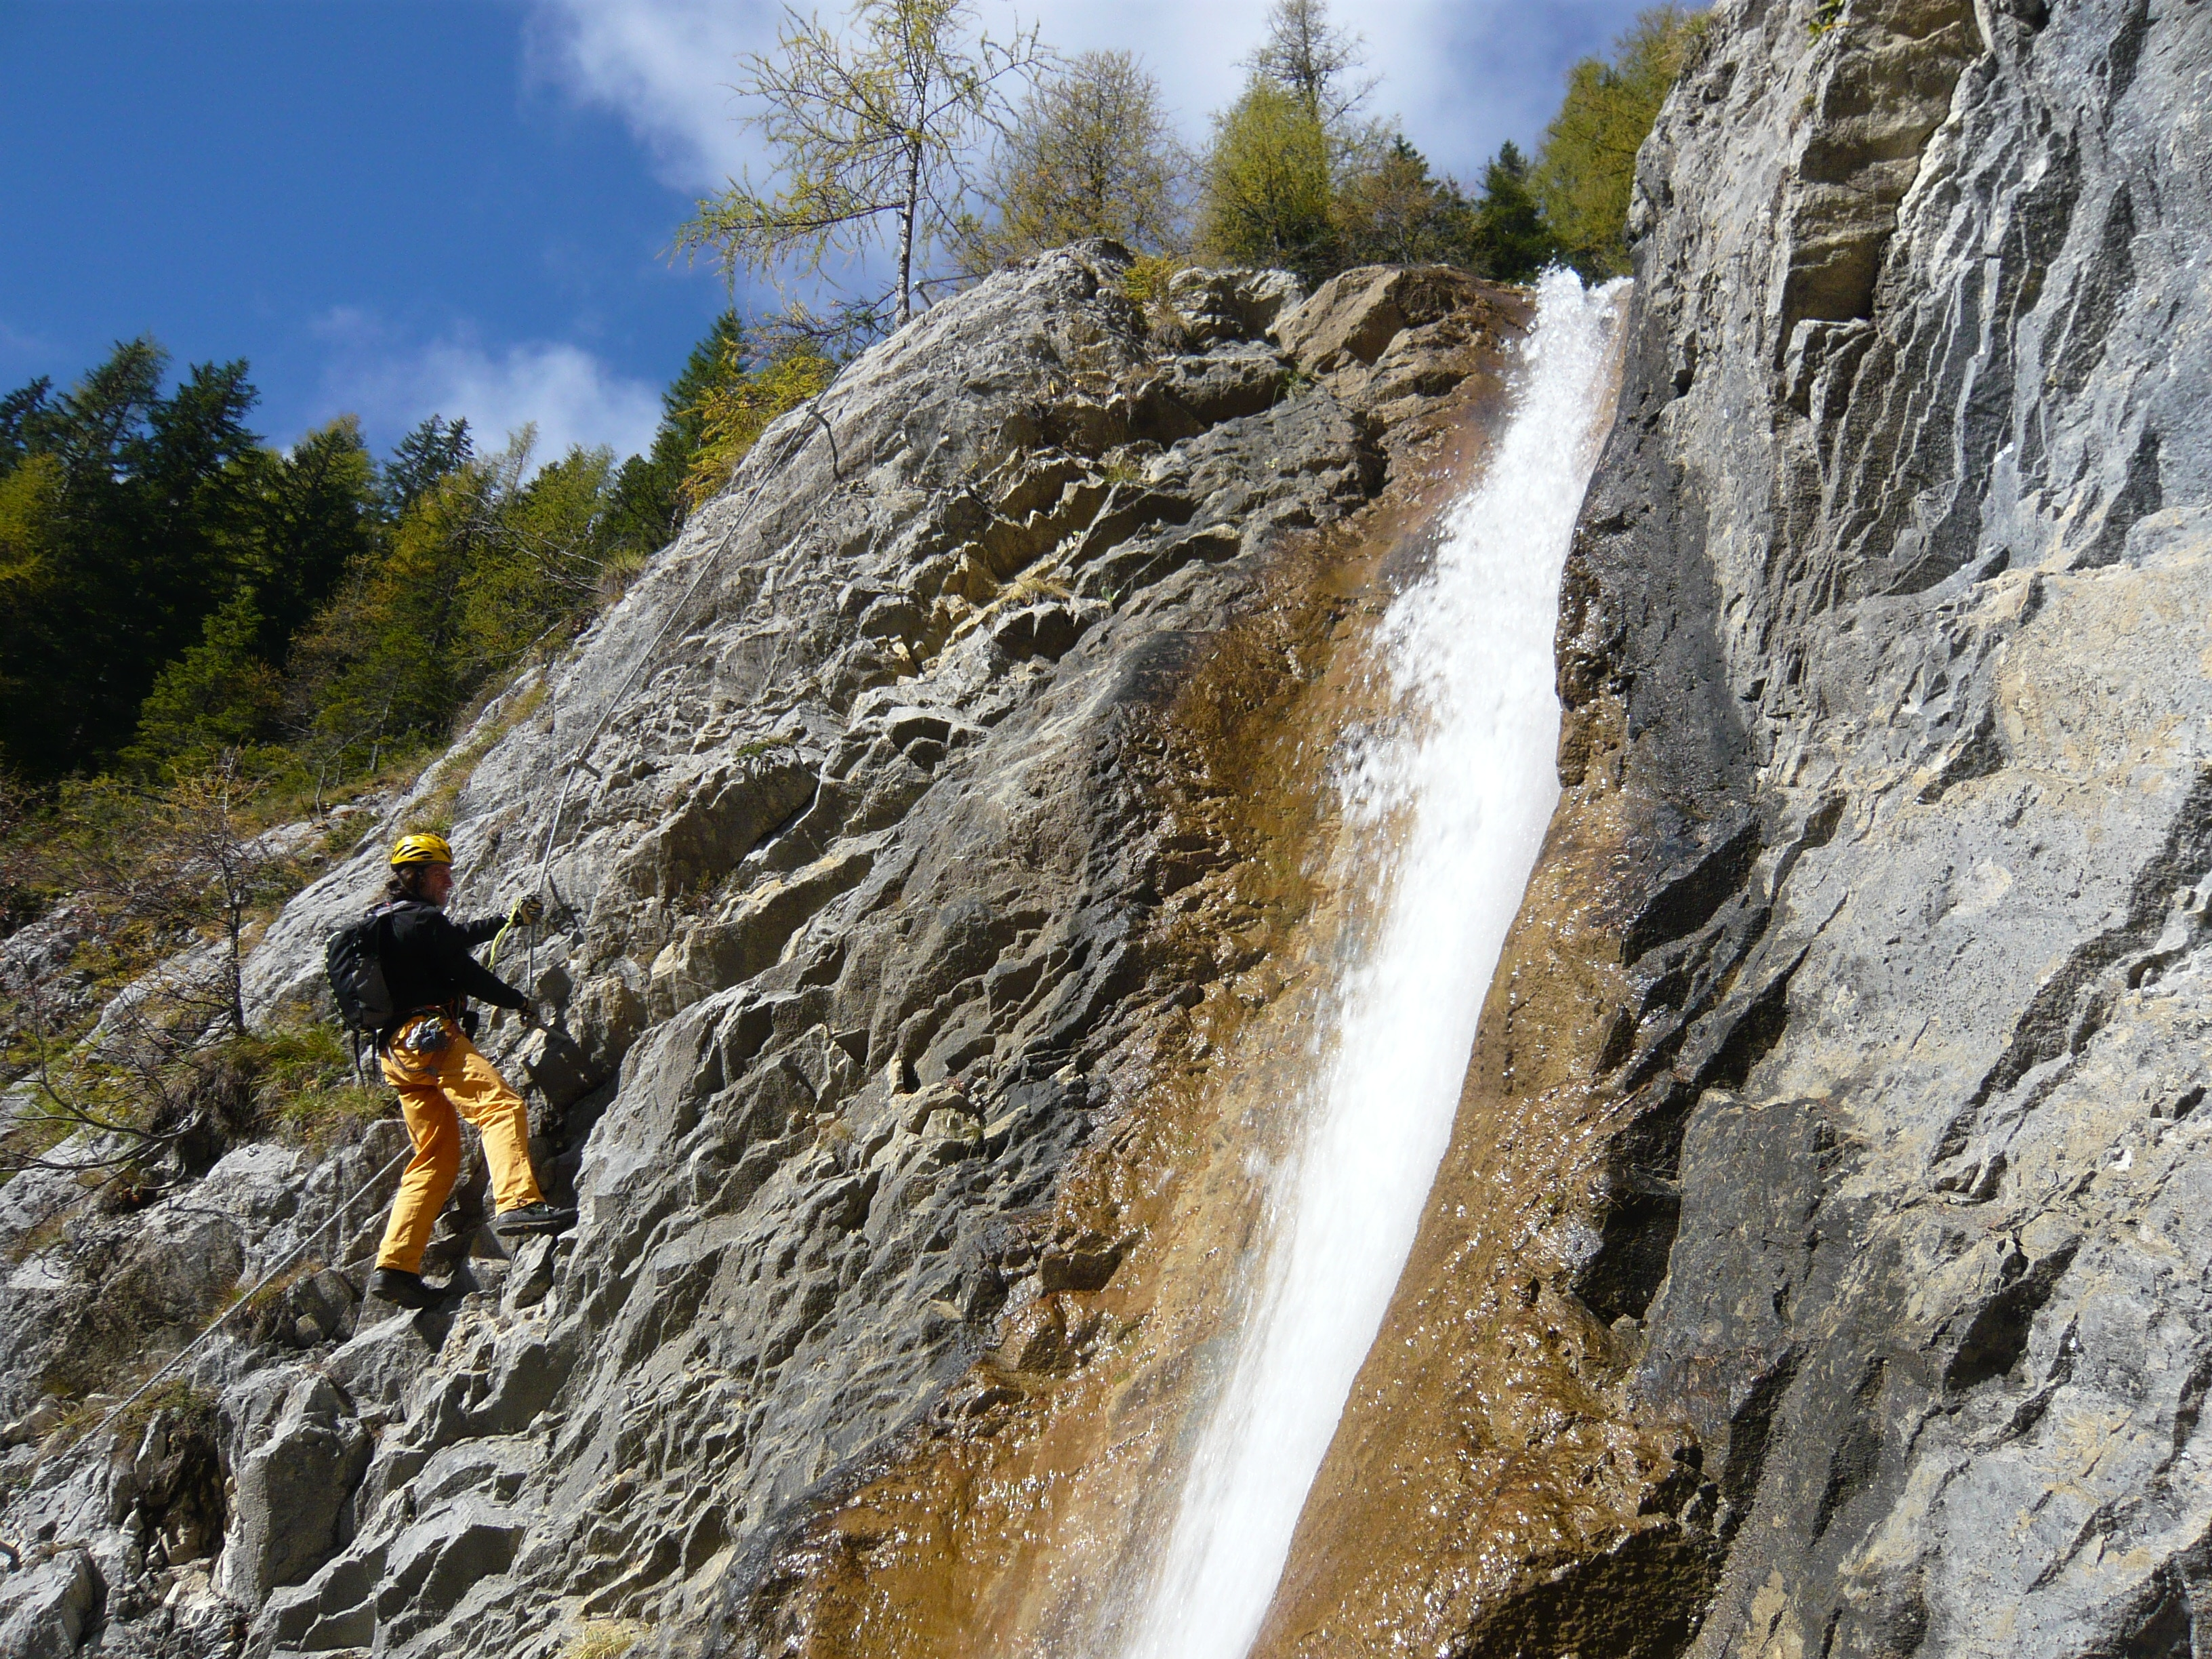 Klettersteig Verborgene Welt : Klettersteige: verborgene welt 0km bergwelten